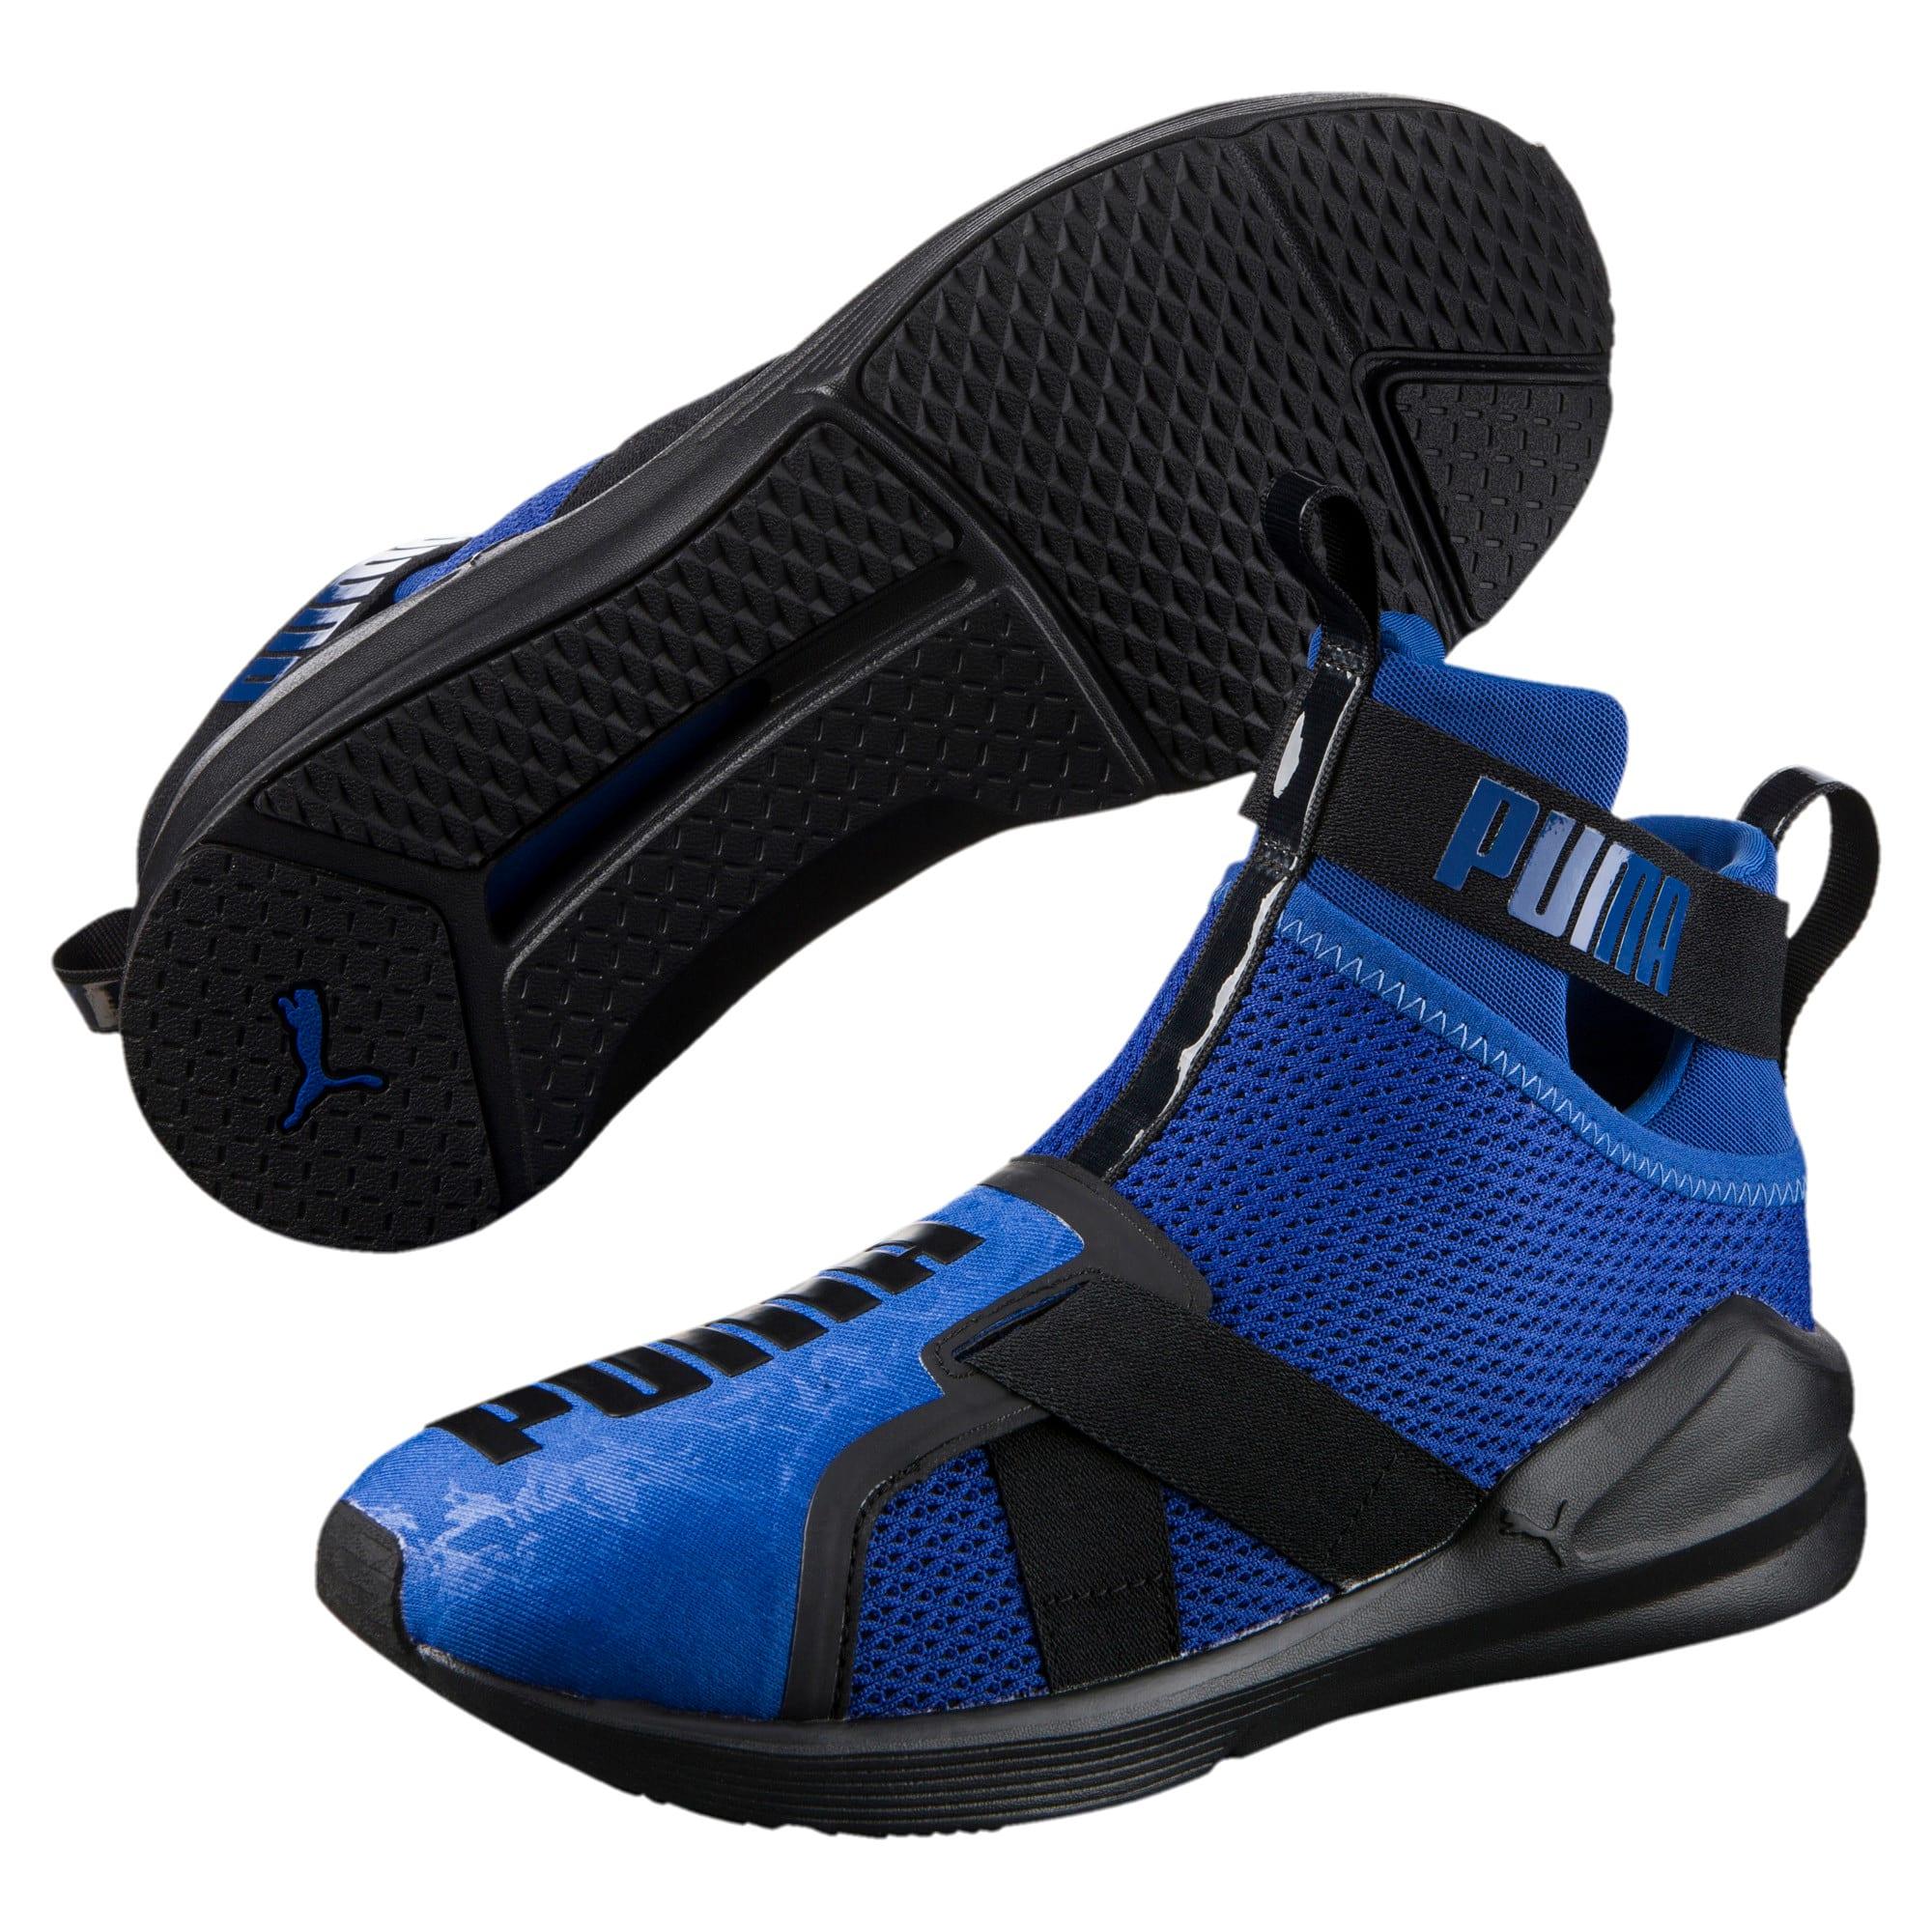 Thumbnail 2 of PUMA Fierce Strap Training Shoes, TRUE BLUE-Puma Black, medium-IND